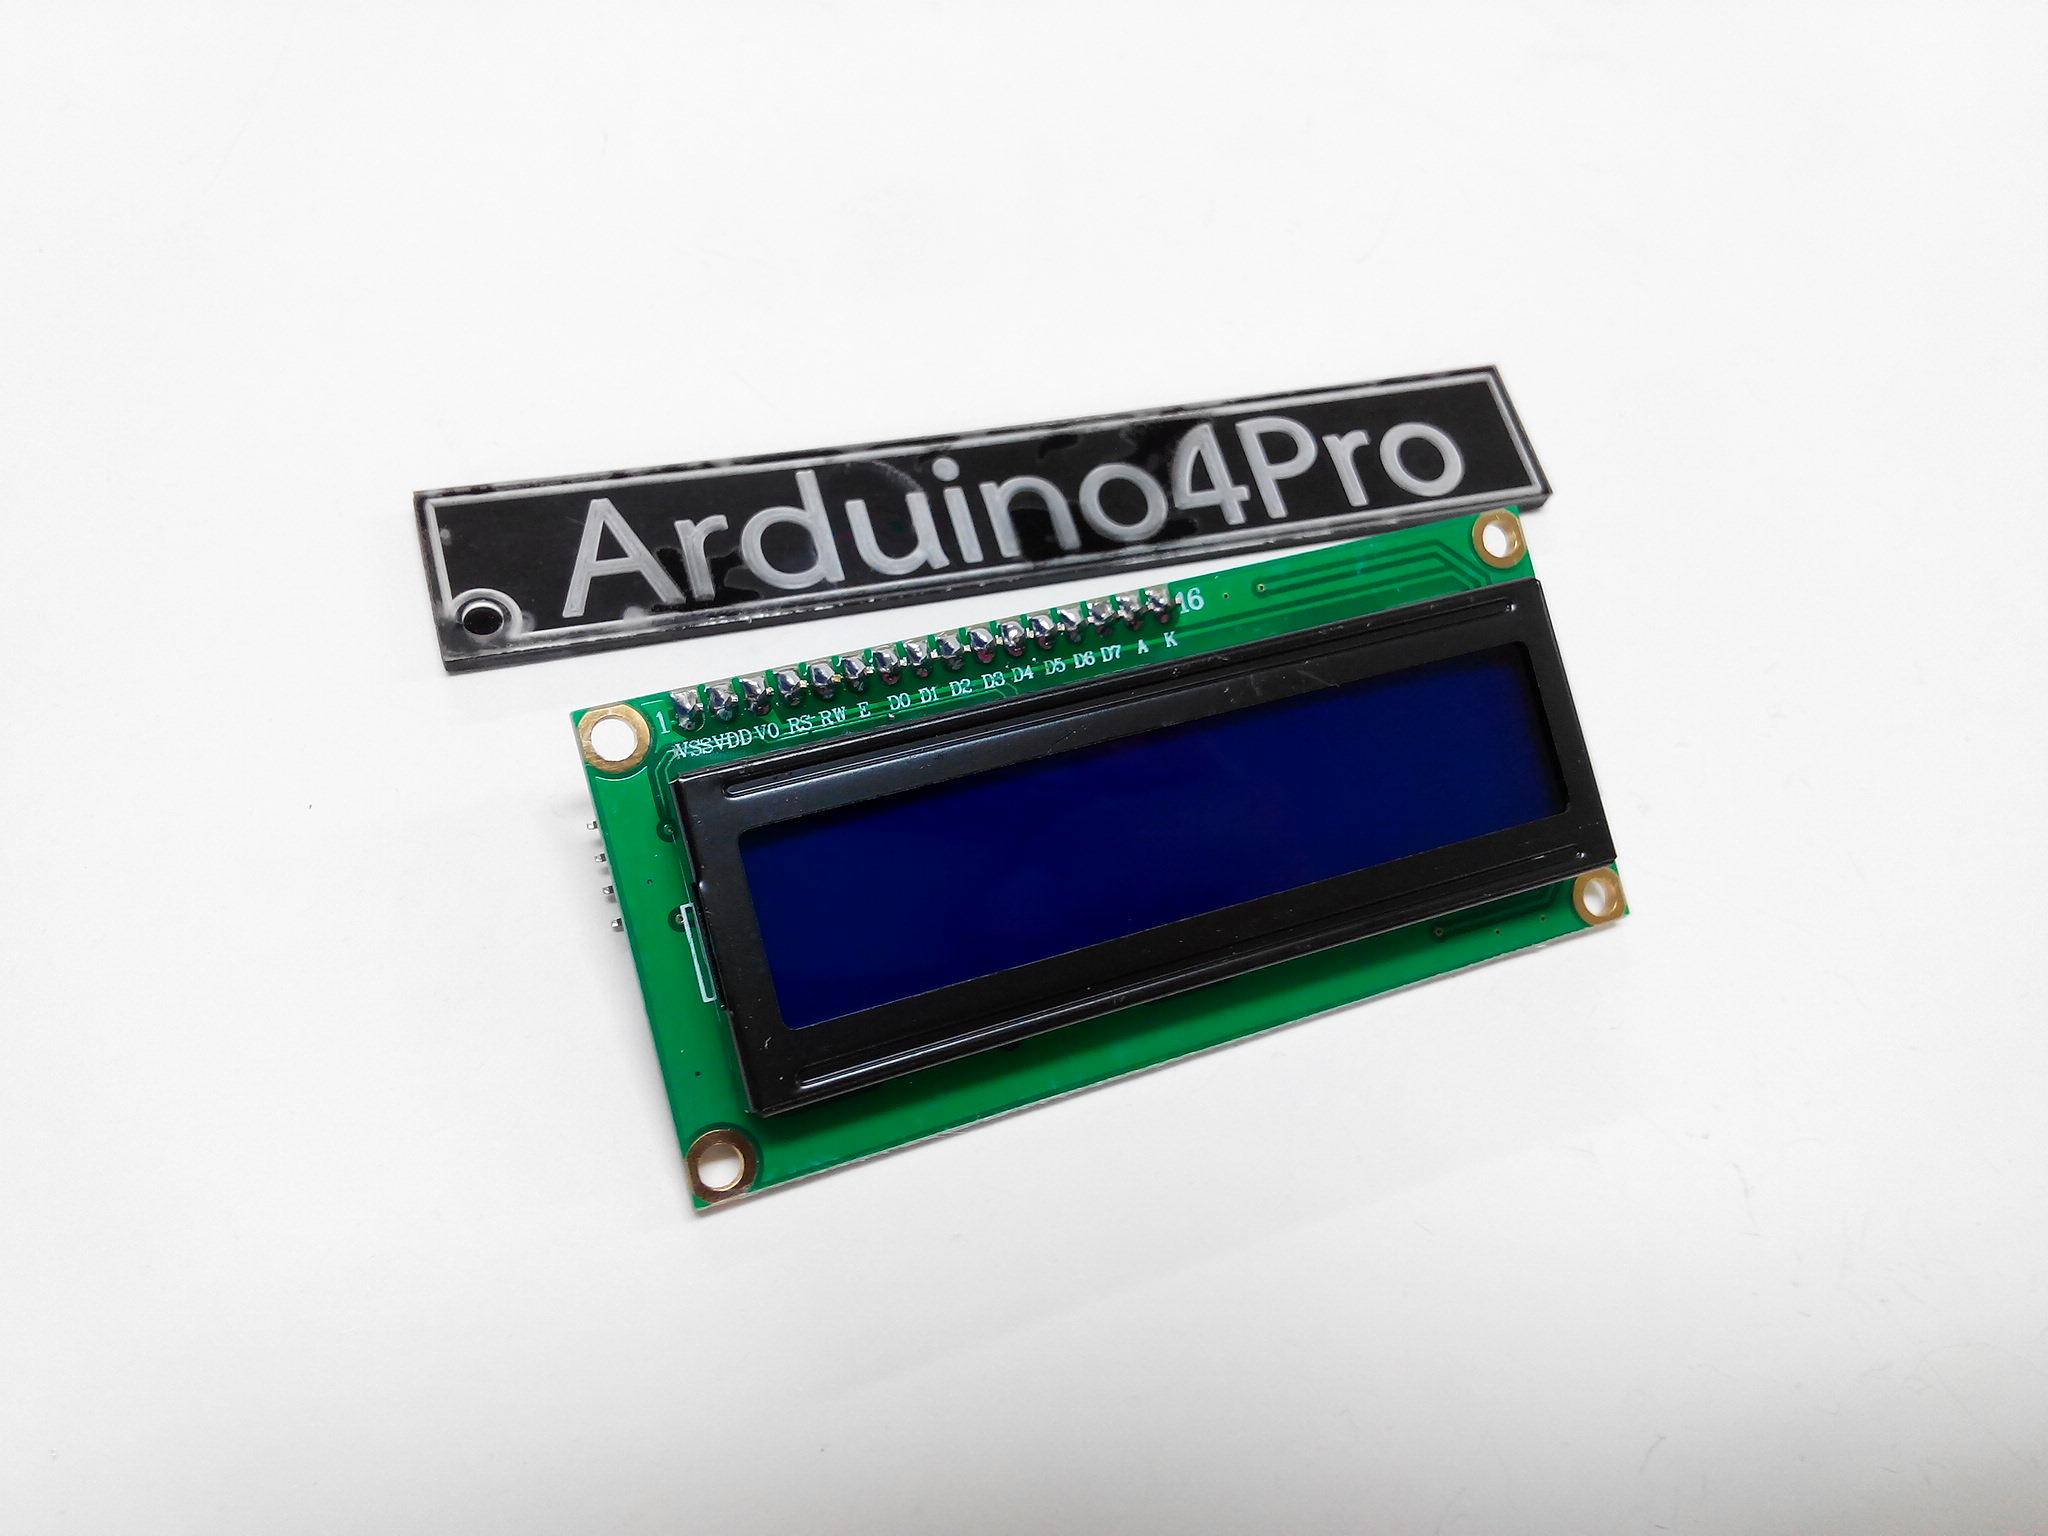 16x2 LCD (Blue Screen) พร้อม I2C Interface